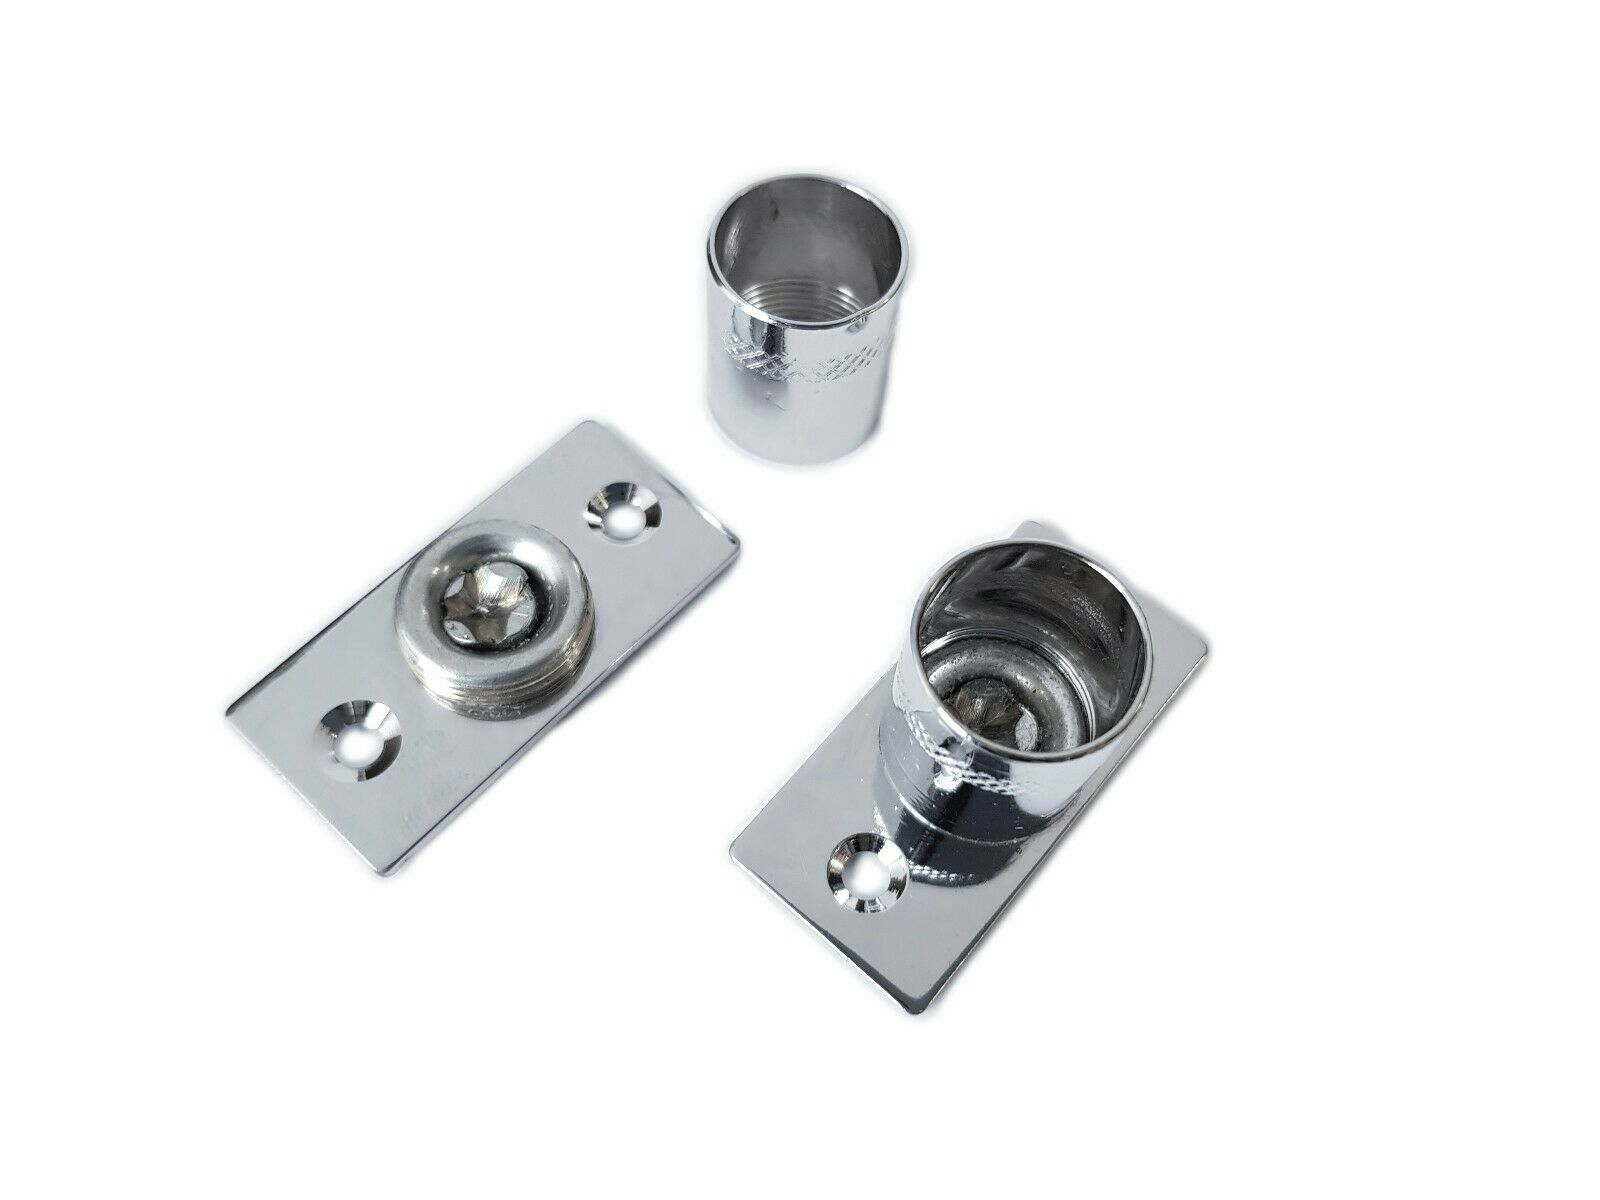 2 chrome curtain rod recess brackets 16mm pole support brackets net voile socket